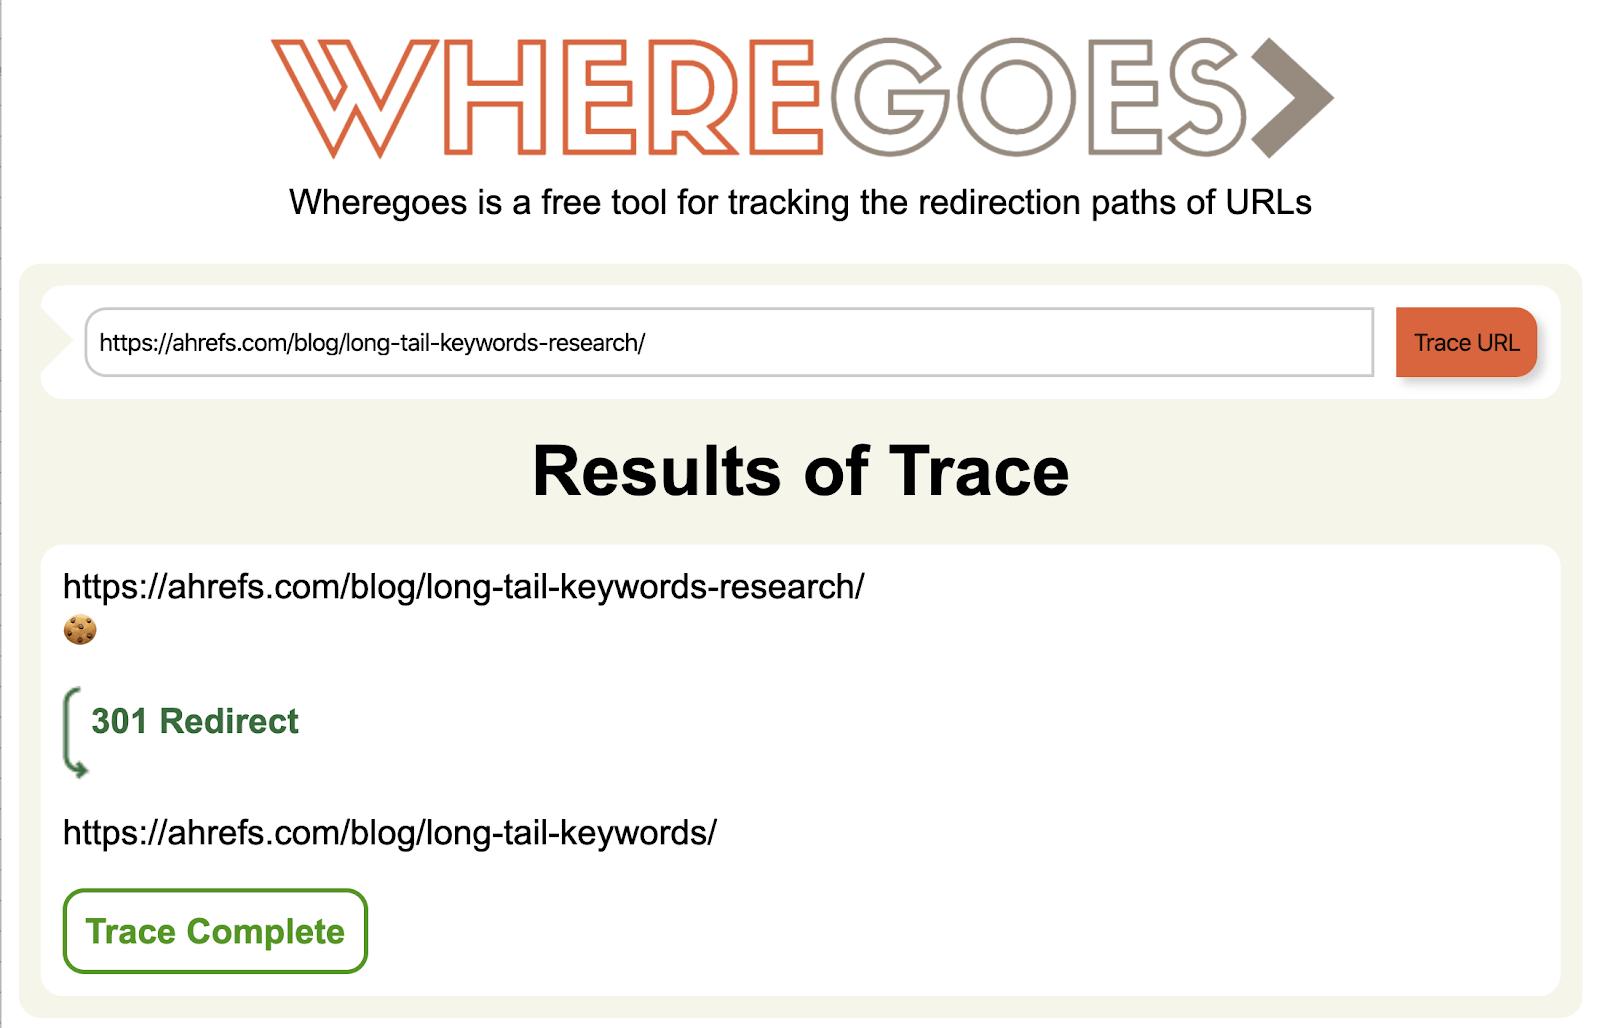 wheregoes